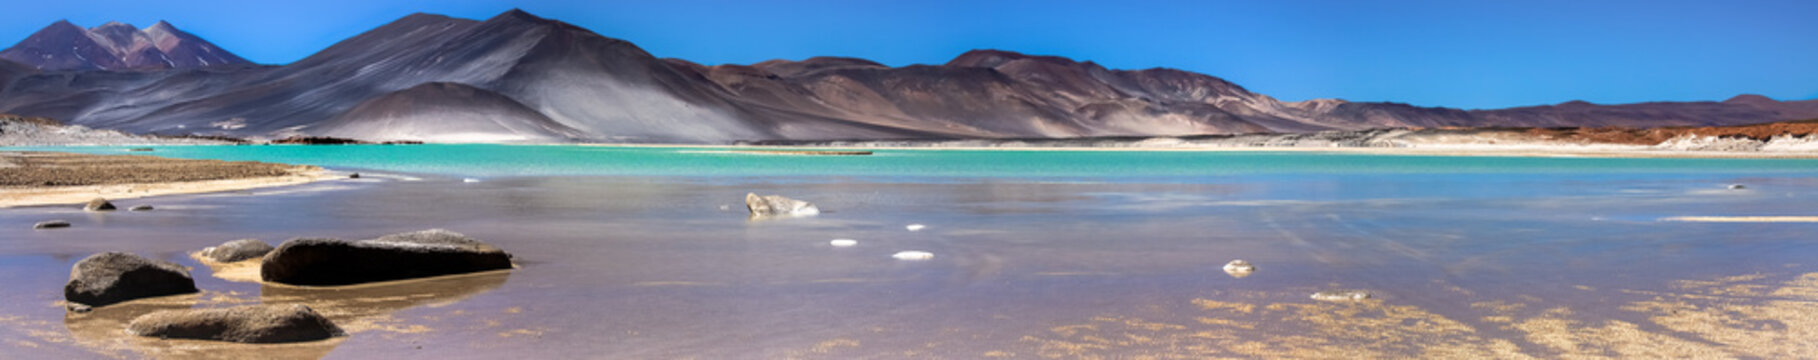 Panorama Salar de Talar, Atacama Desert, Chile